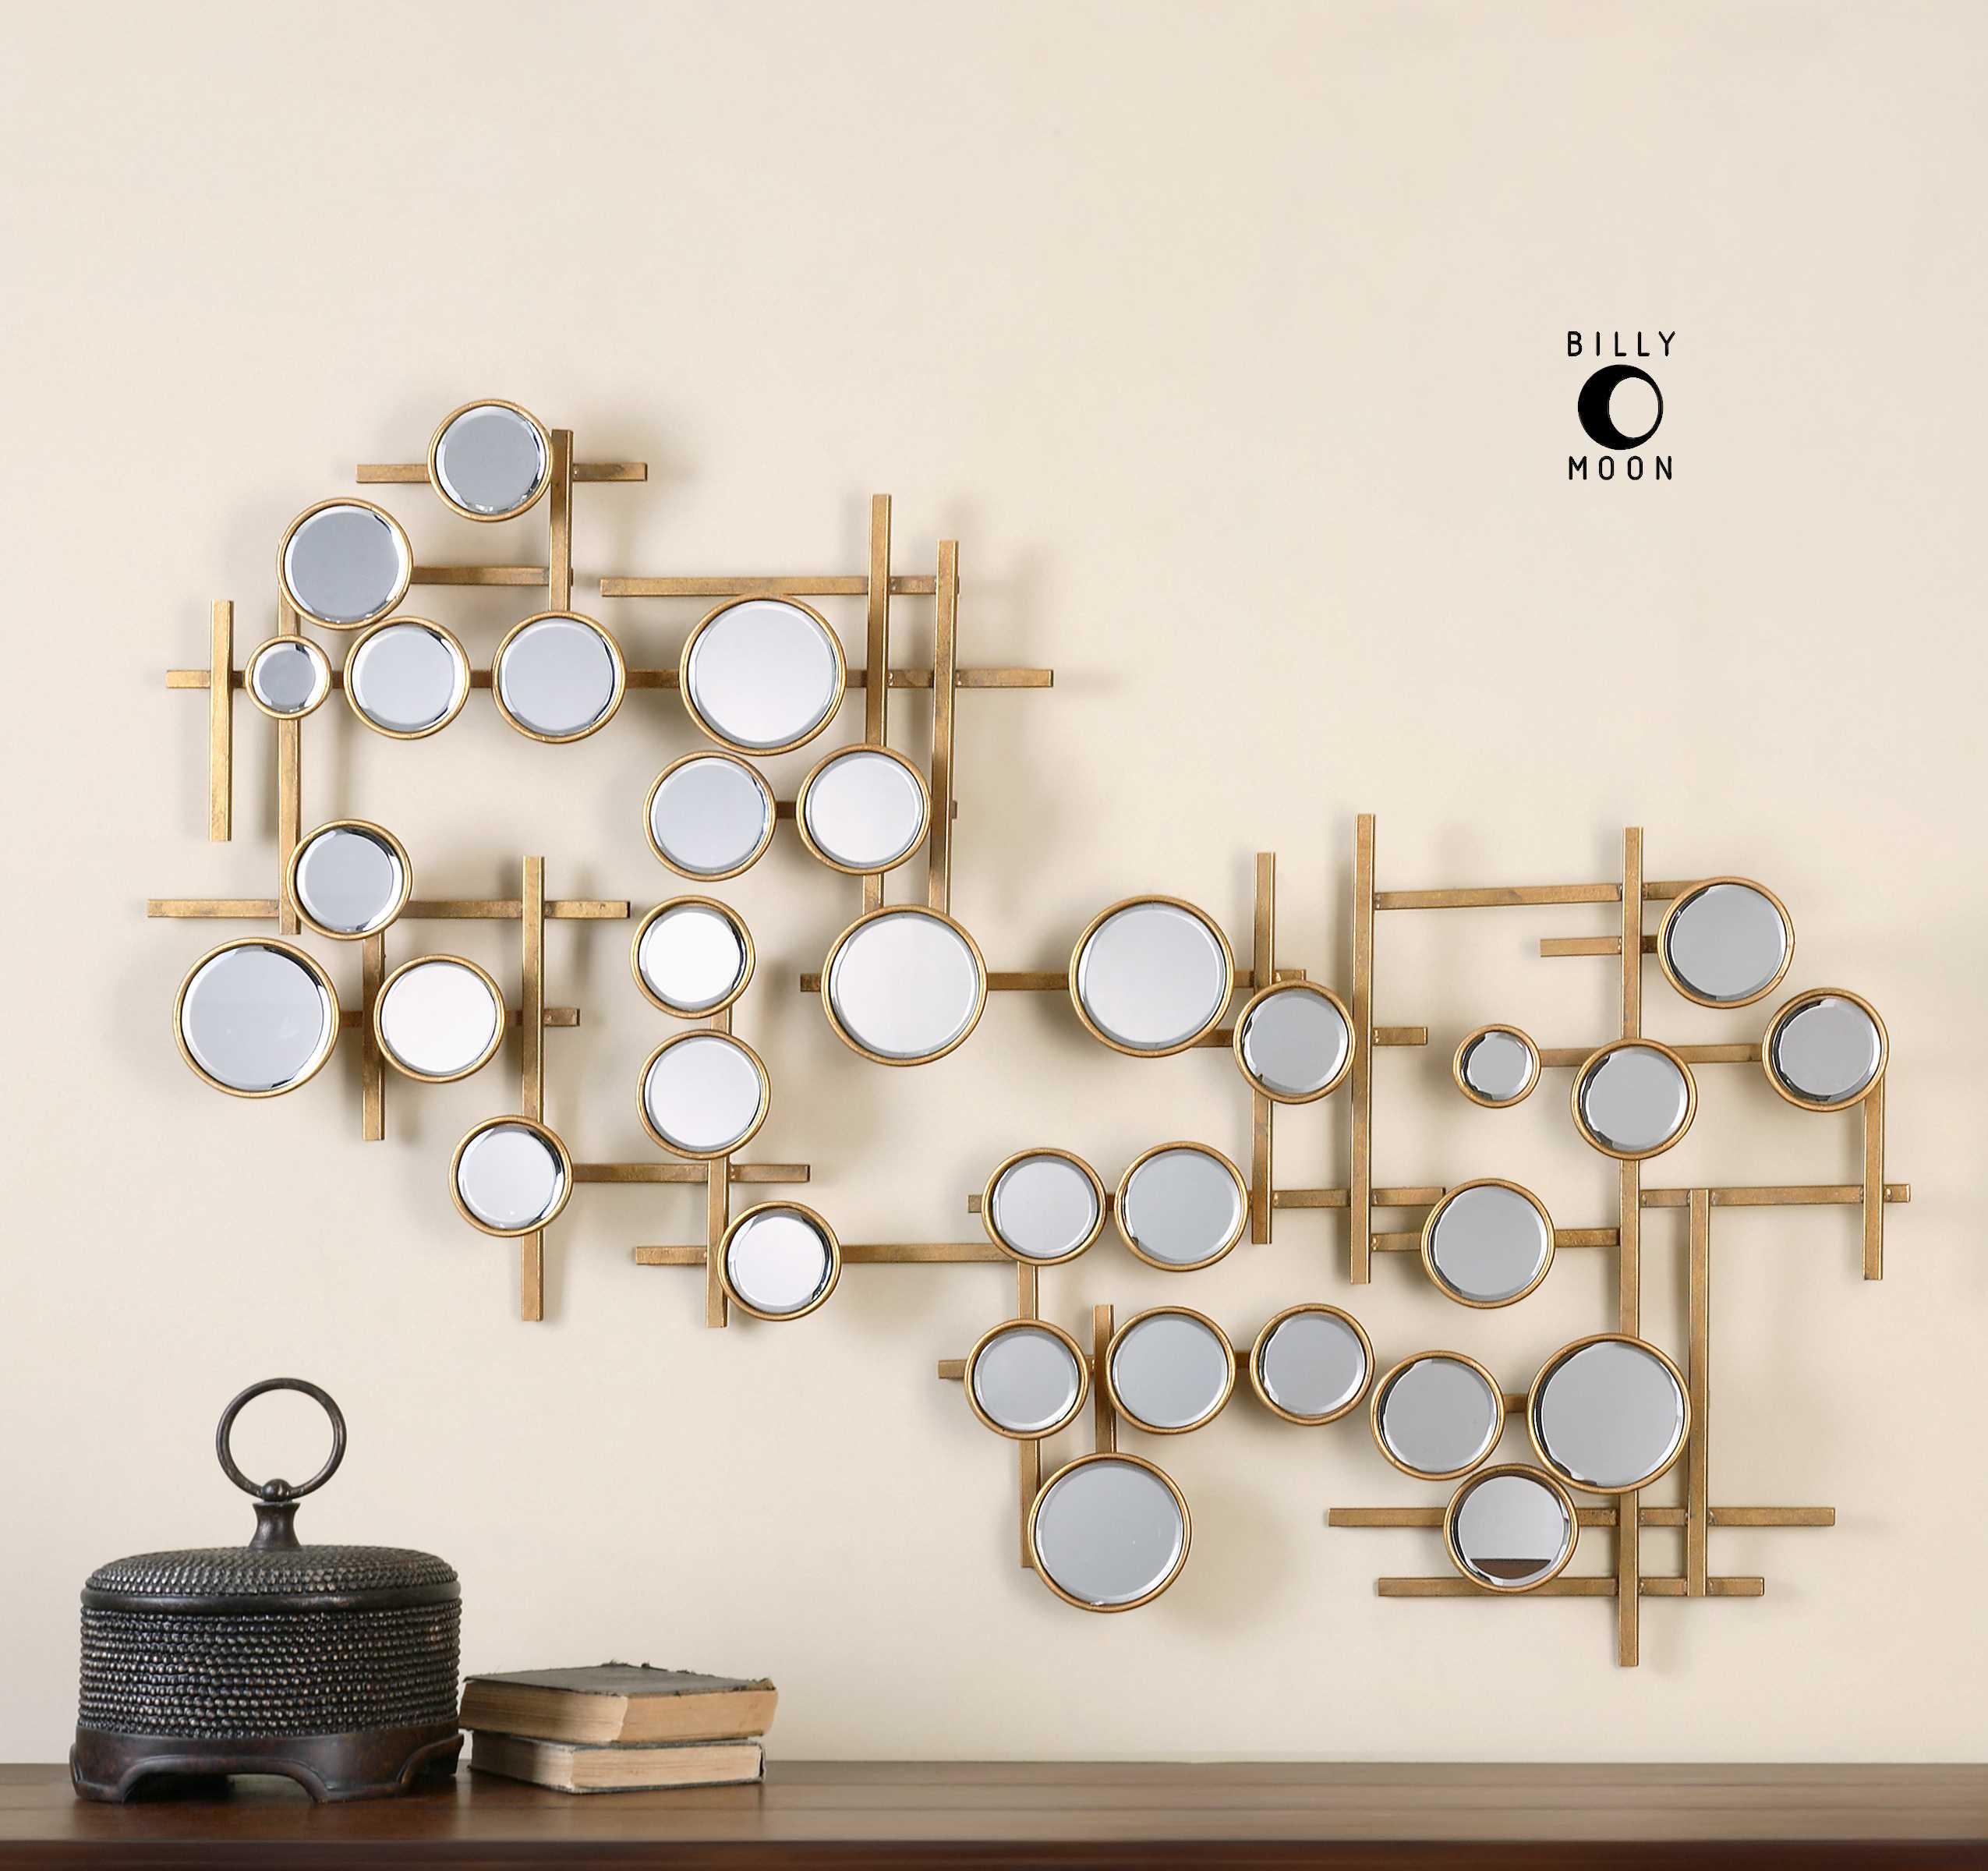 uttermost britton mirrored wall art ut08138. Black Bedroom Furniture Sets. Home Design Ideas